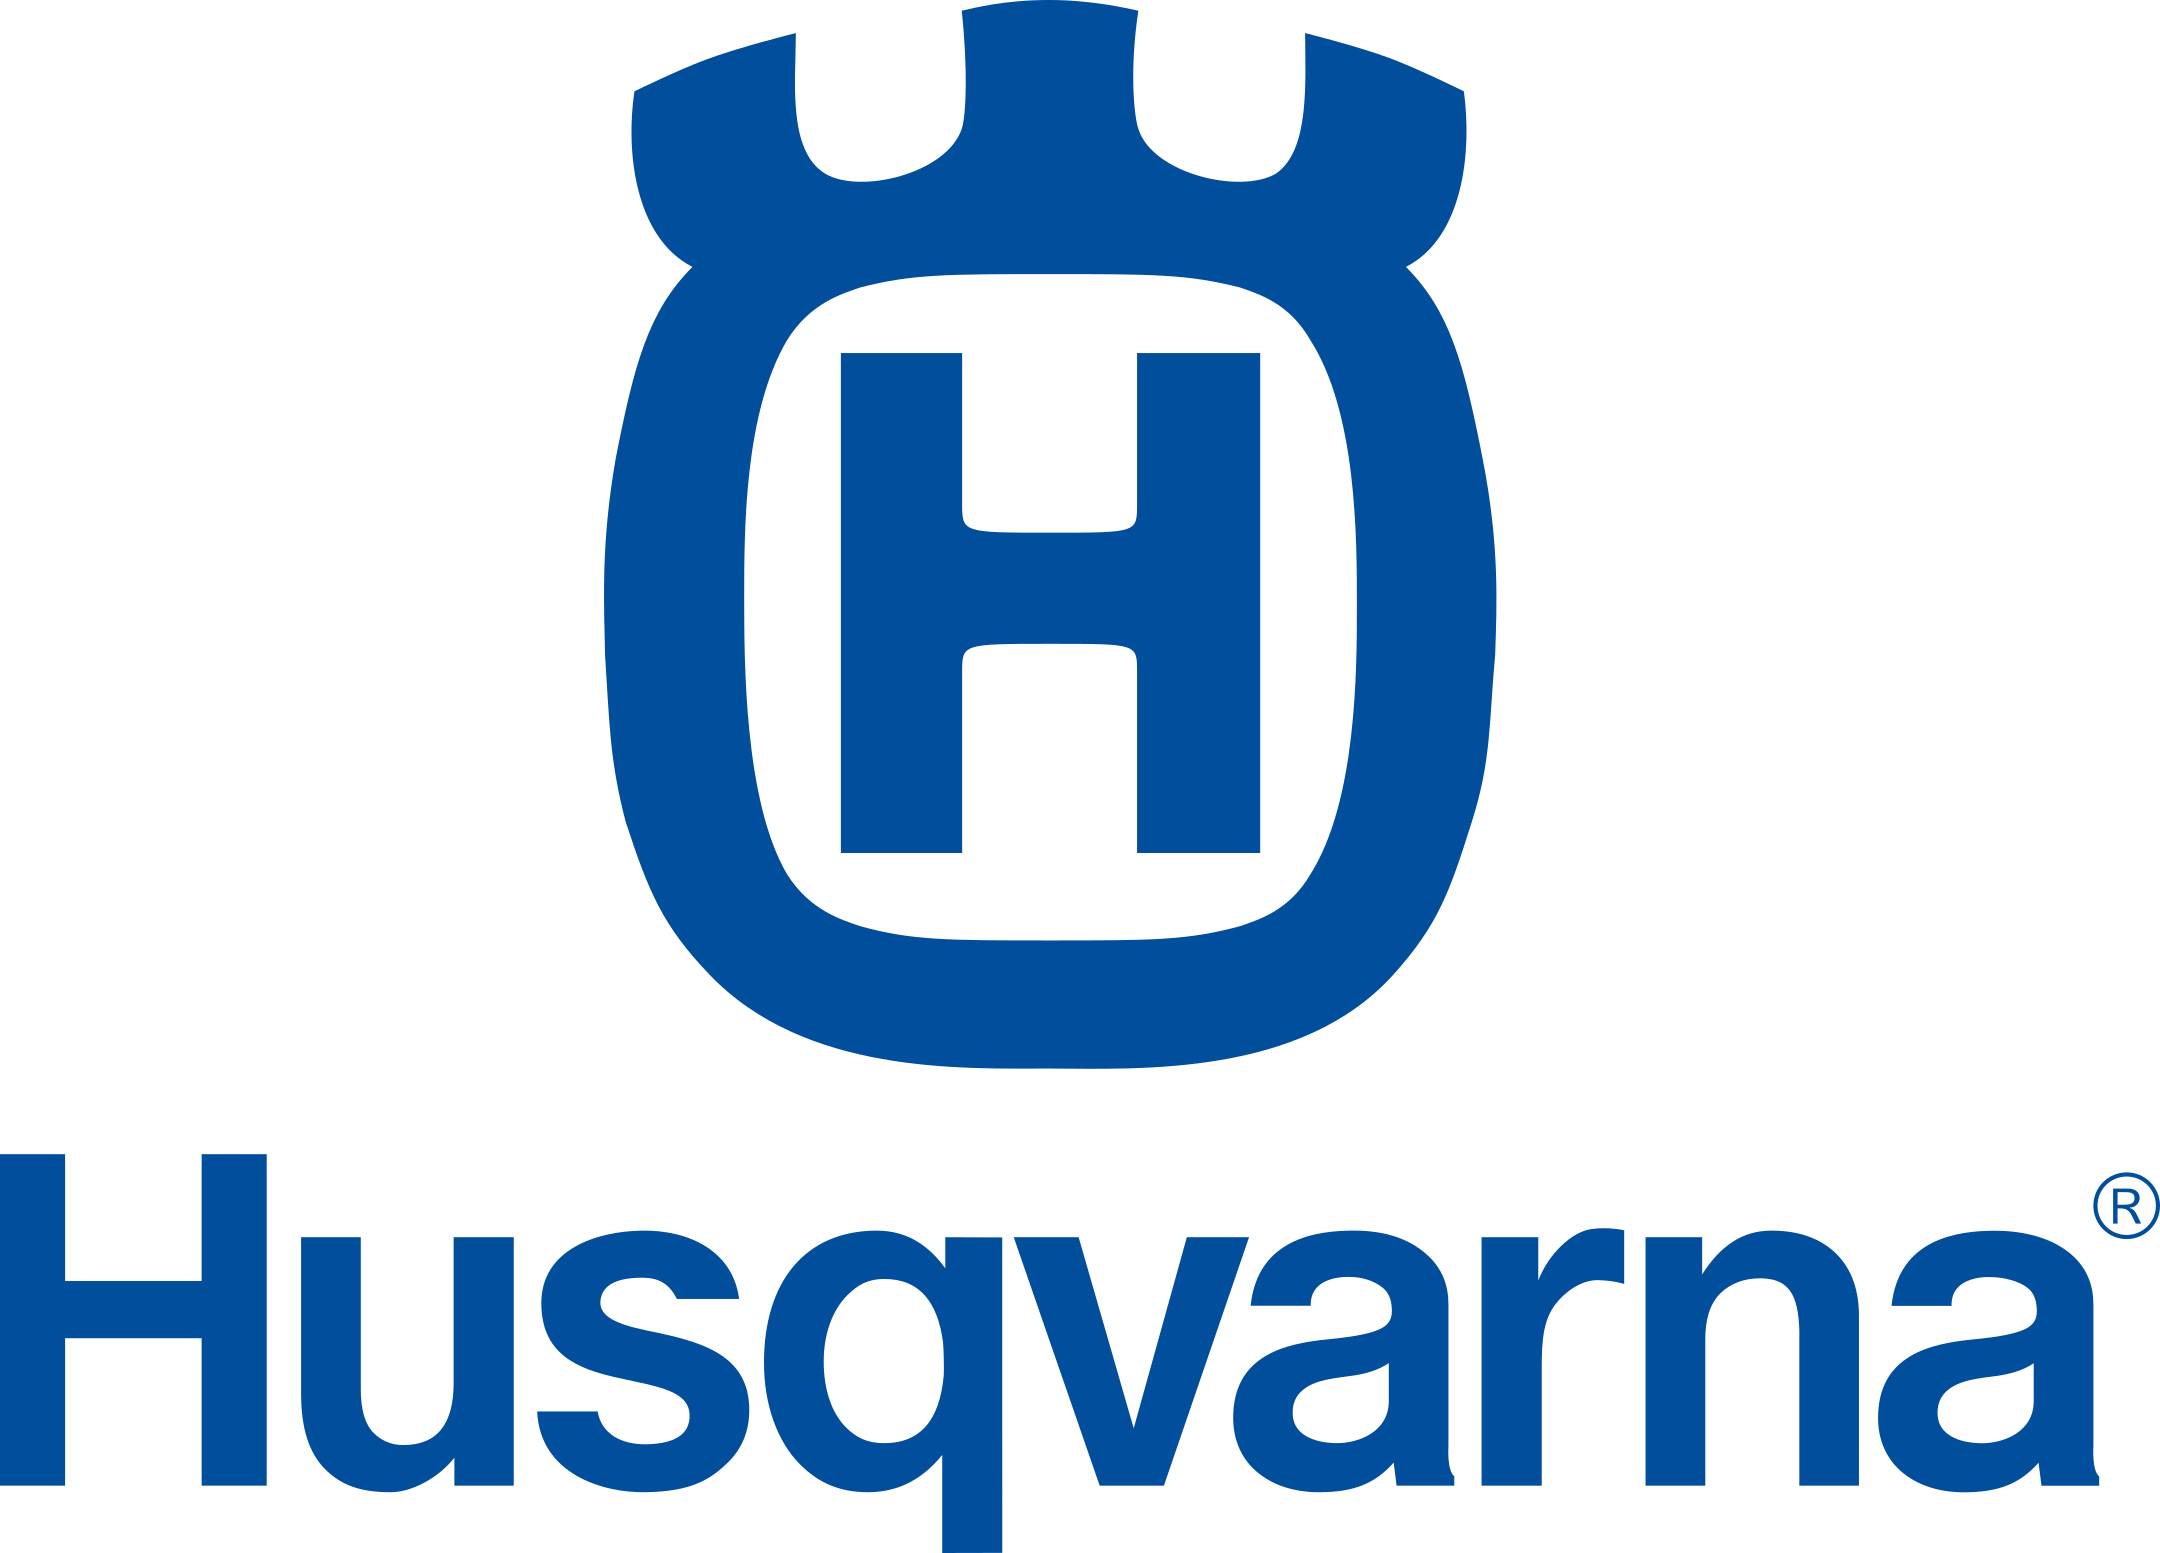 husqvarna logo 3 - Husqvarna Logo